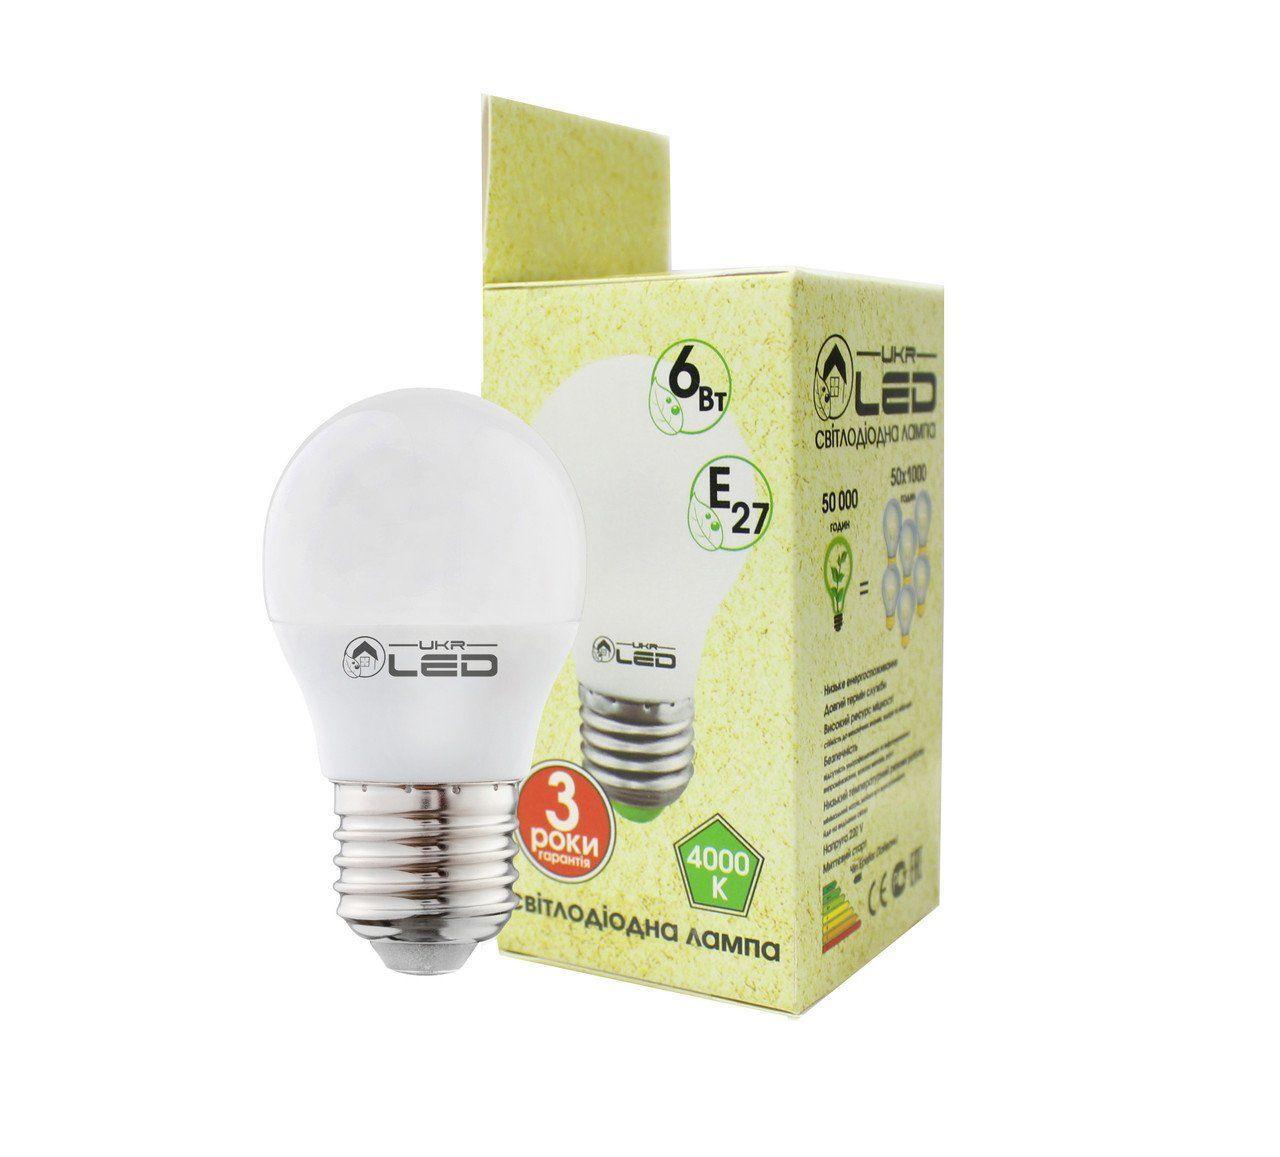 Светодиодная лампа UkrLed Е27 6W (Шарик) 4000К